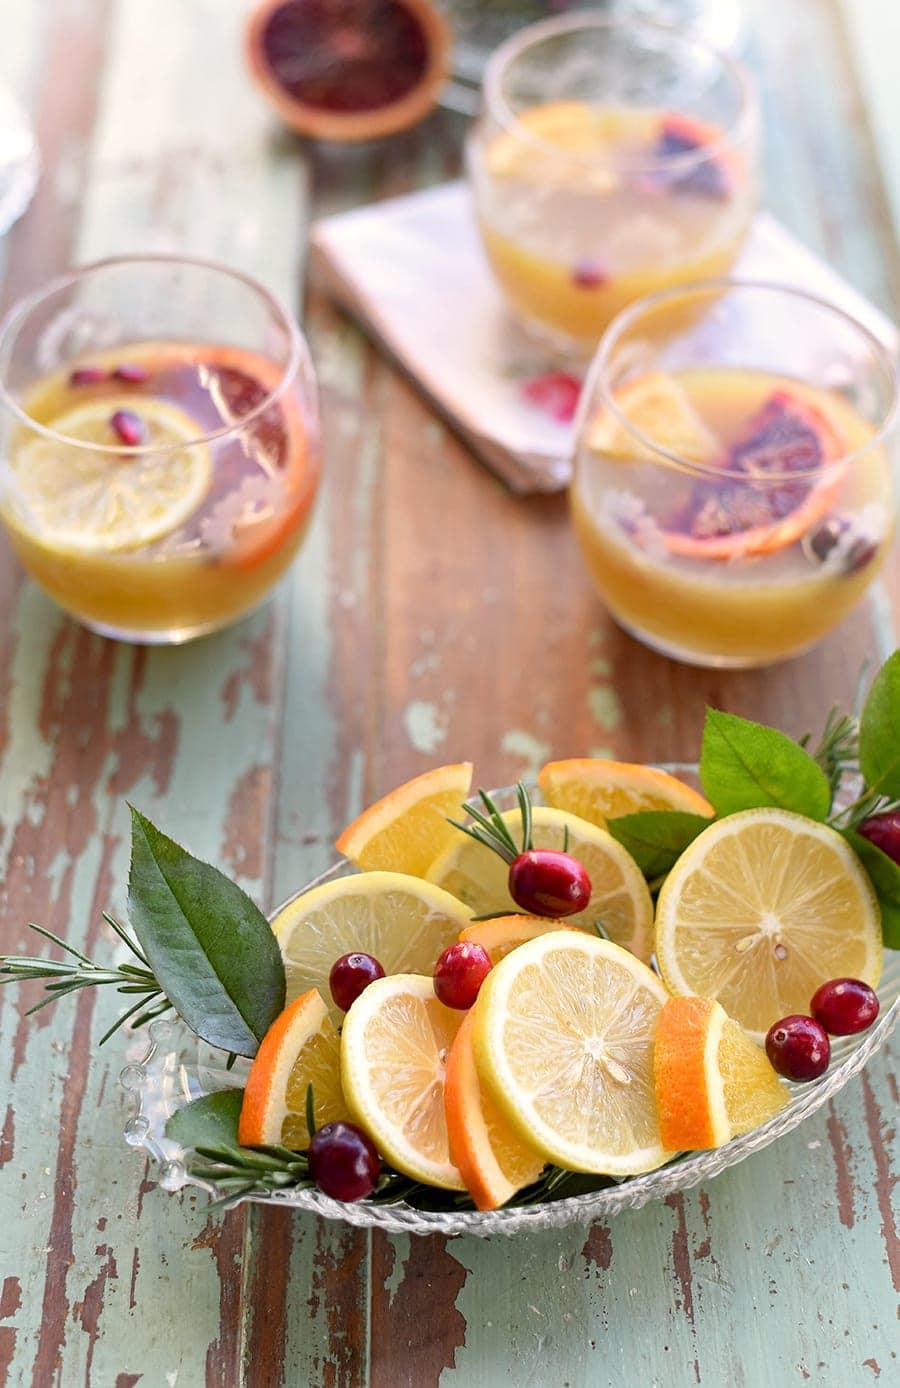 Lemons, oranges and cranberries for cocktail garnish